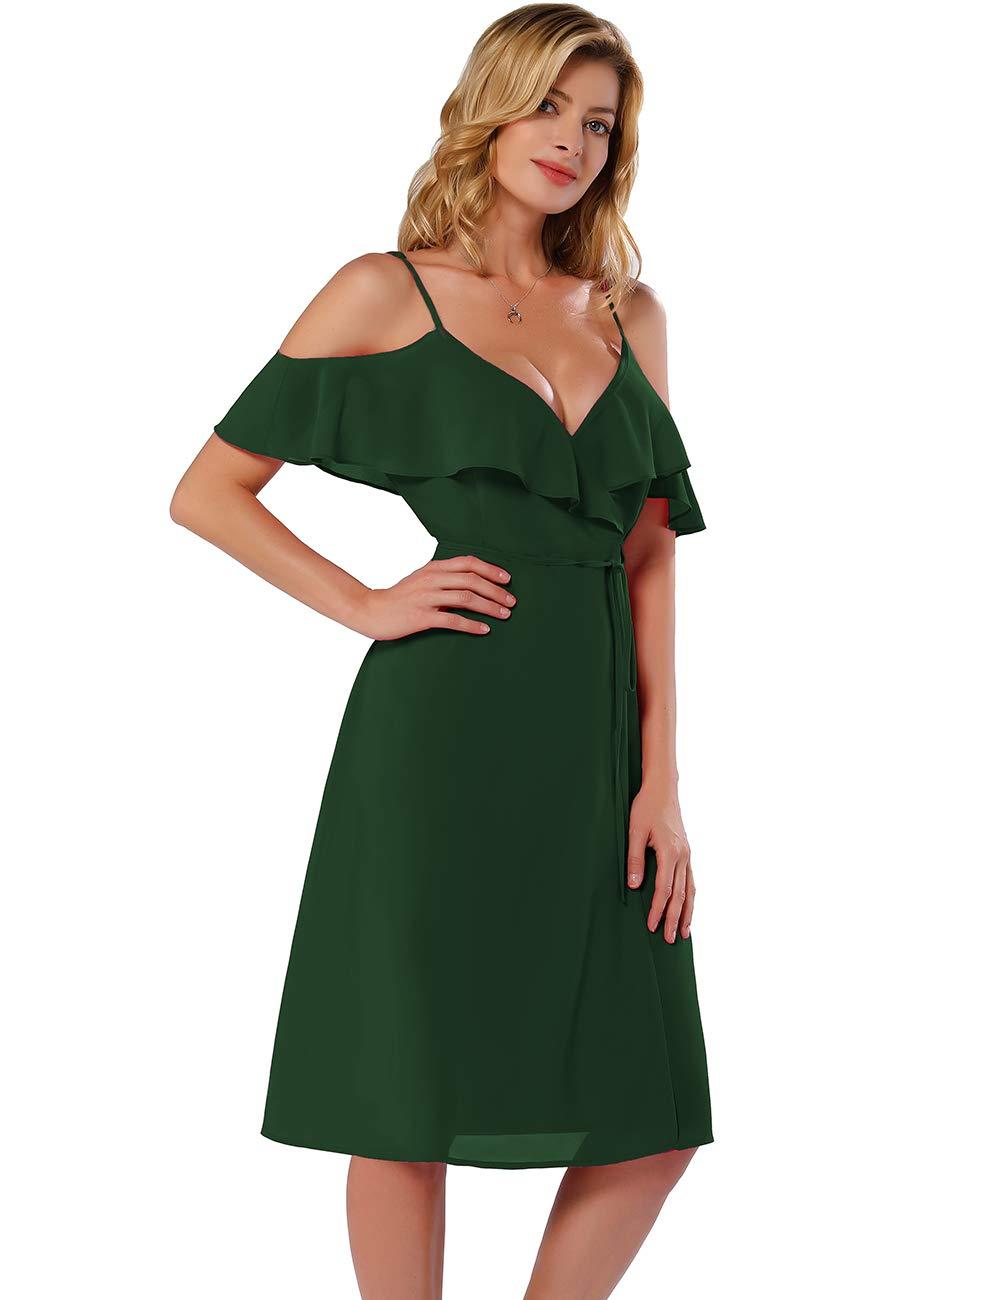 M/&S/&W Womens Summer Chiffon Floral Printed Cold Shoulder Short Dress